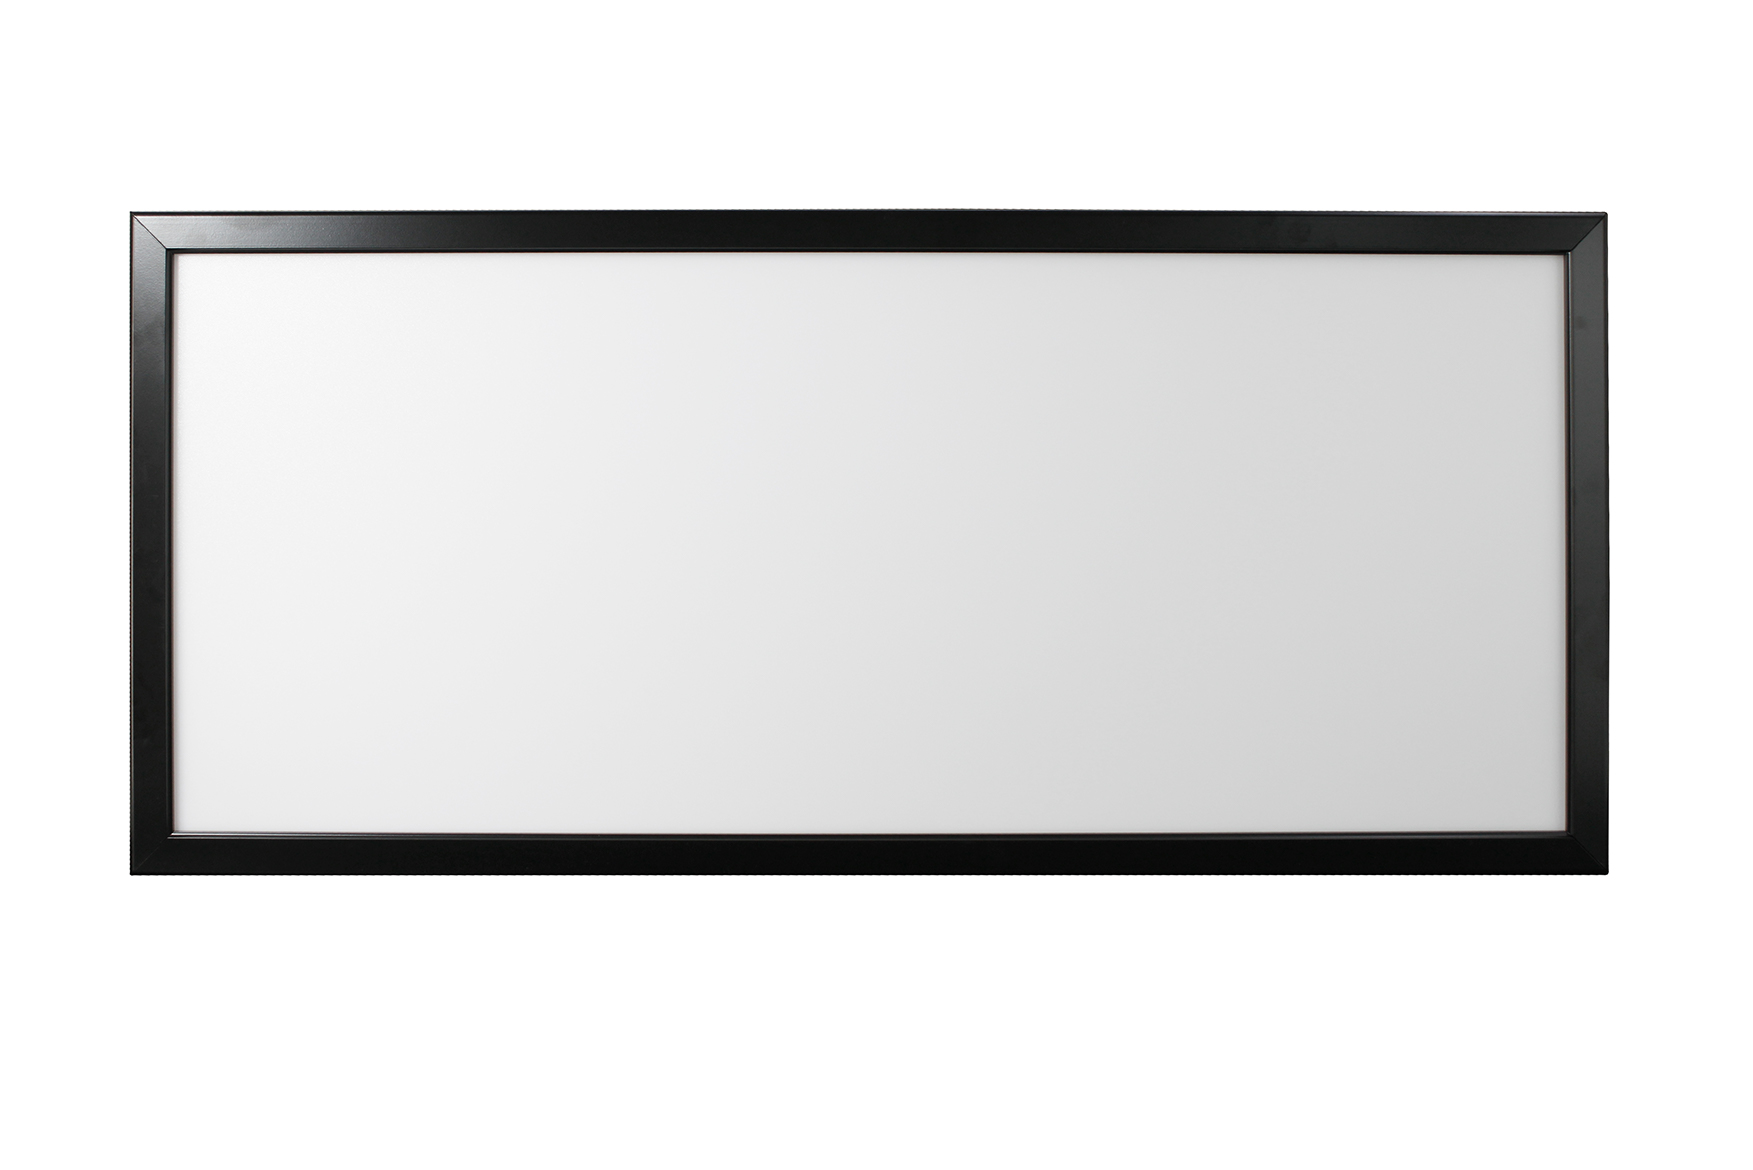 Zeplinn panel